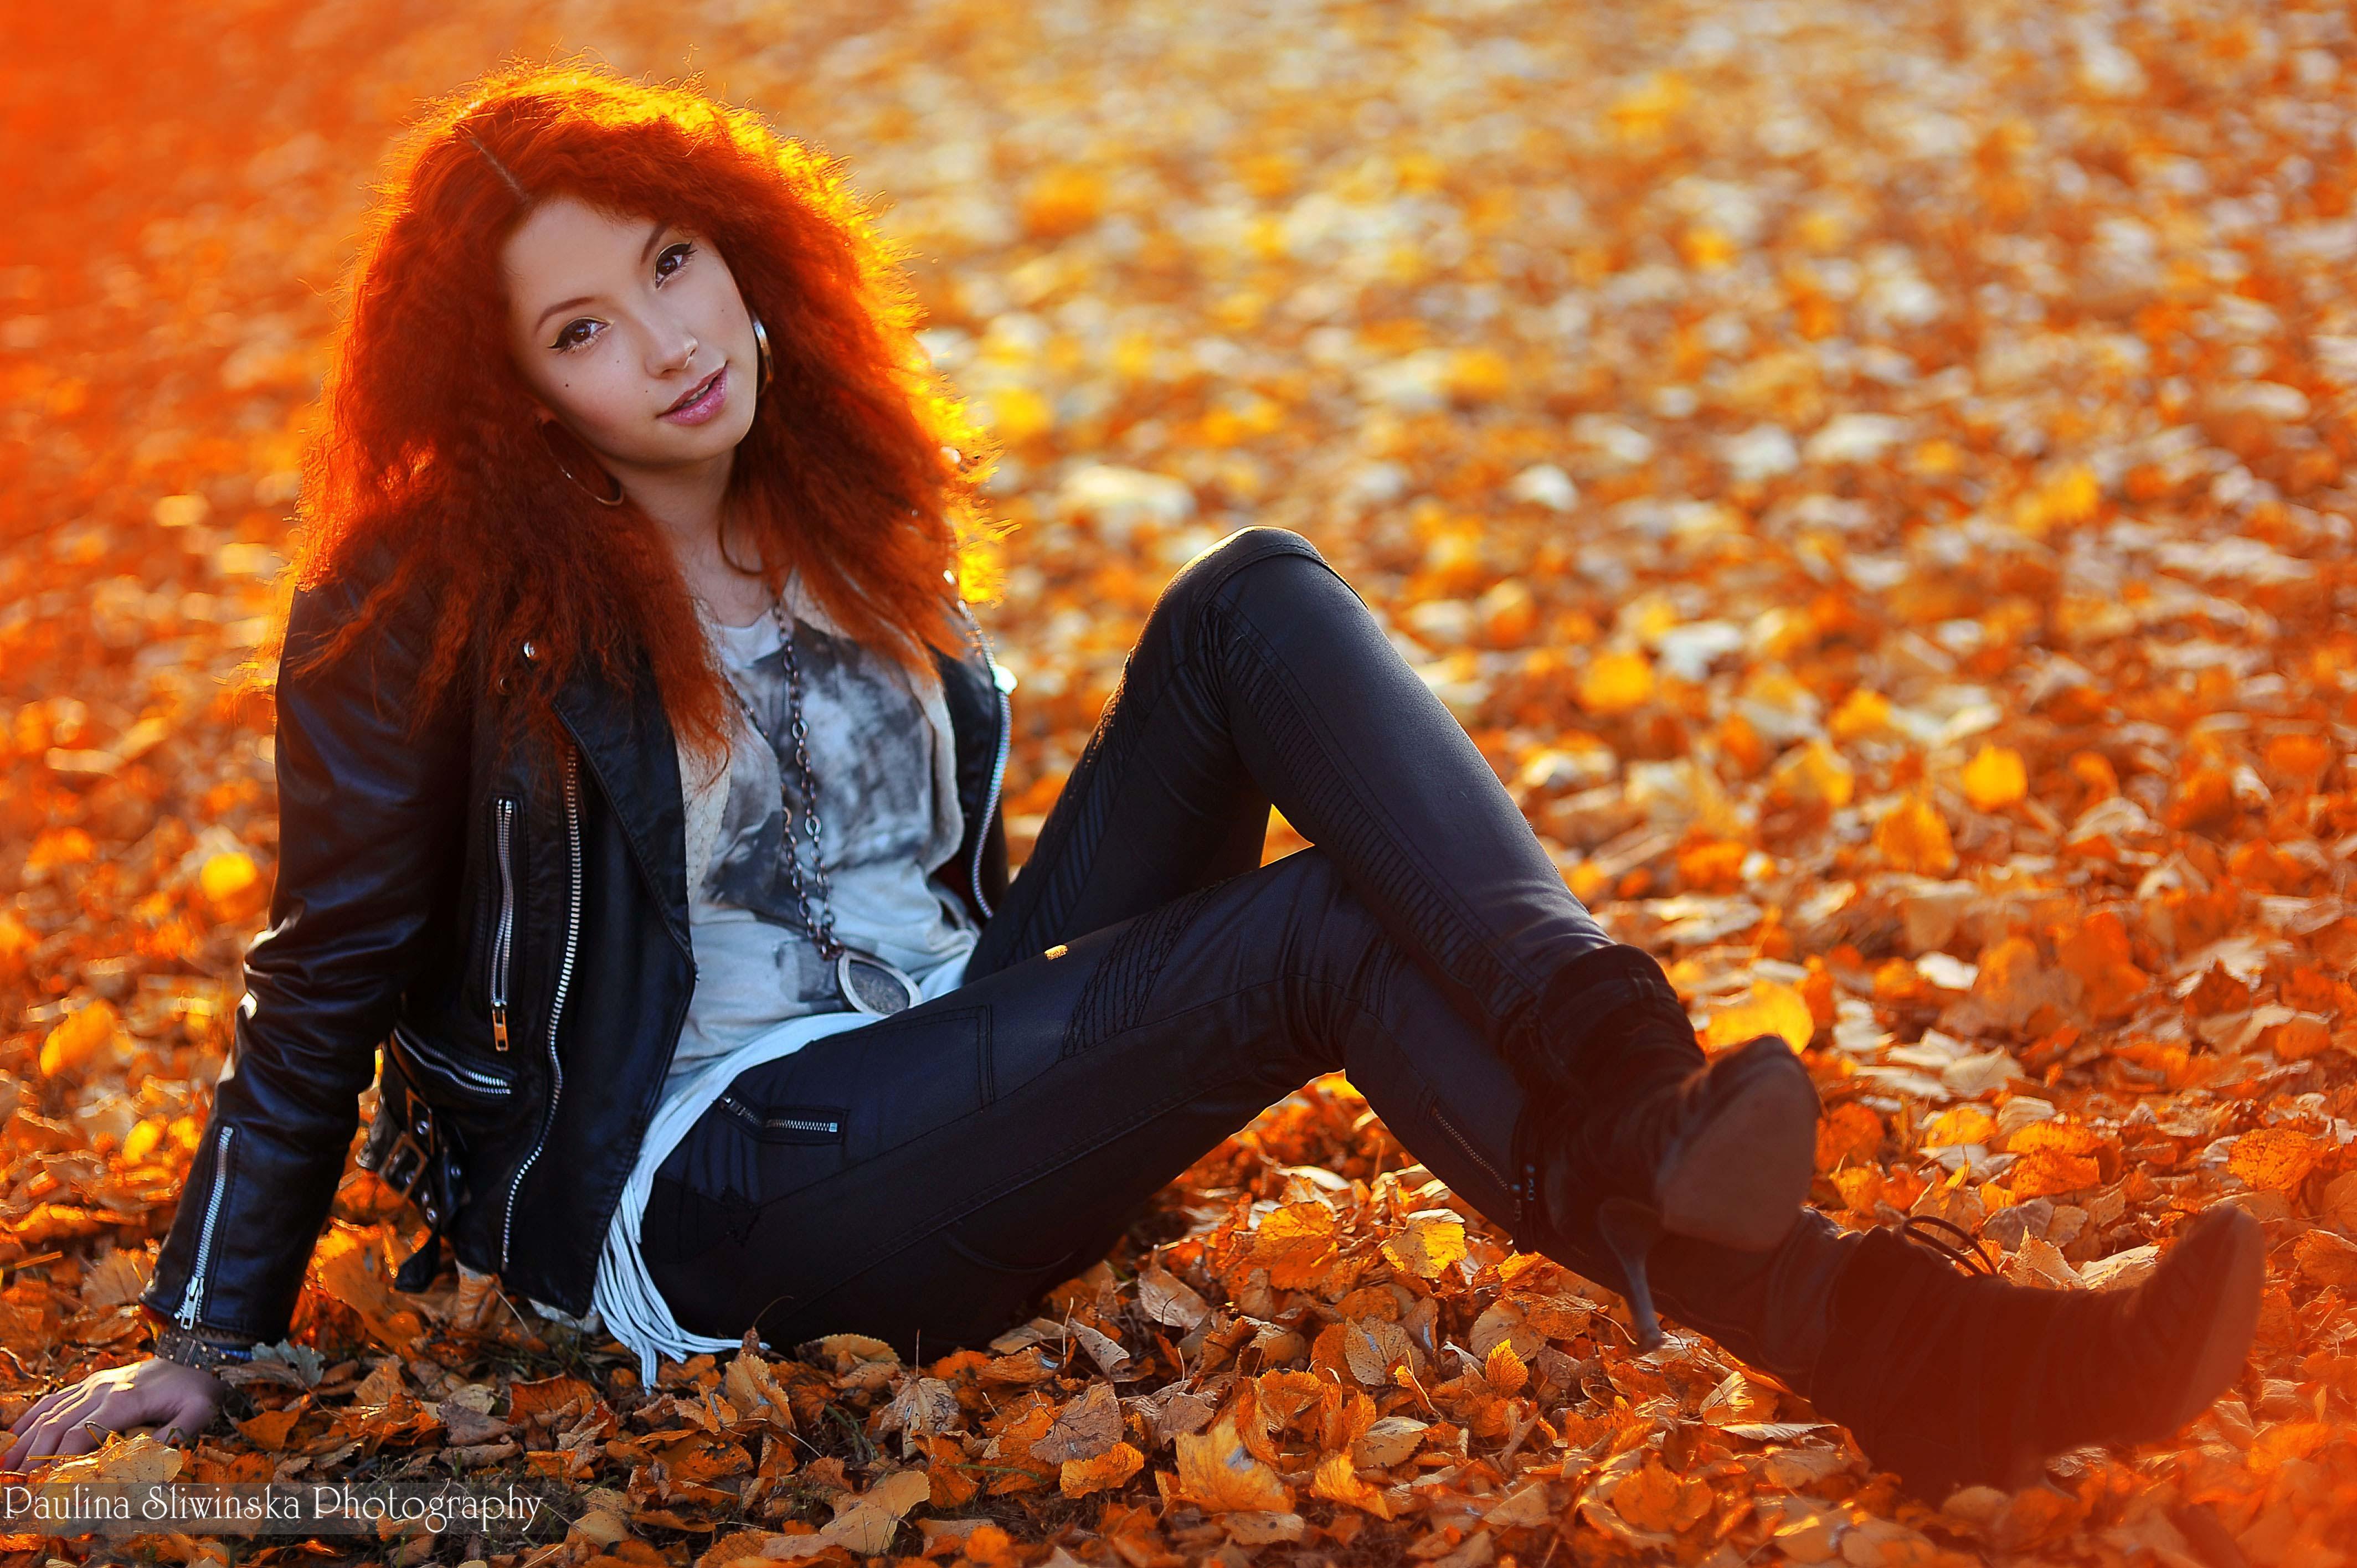 Beautiful Girl Landscape 4K Wallpapers | HD Wallpapers